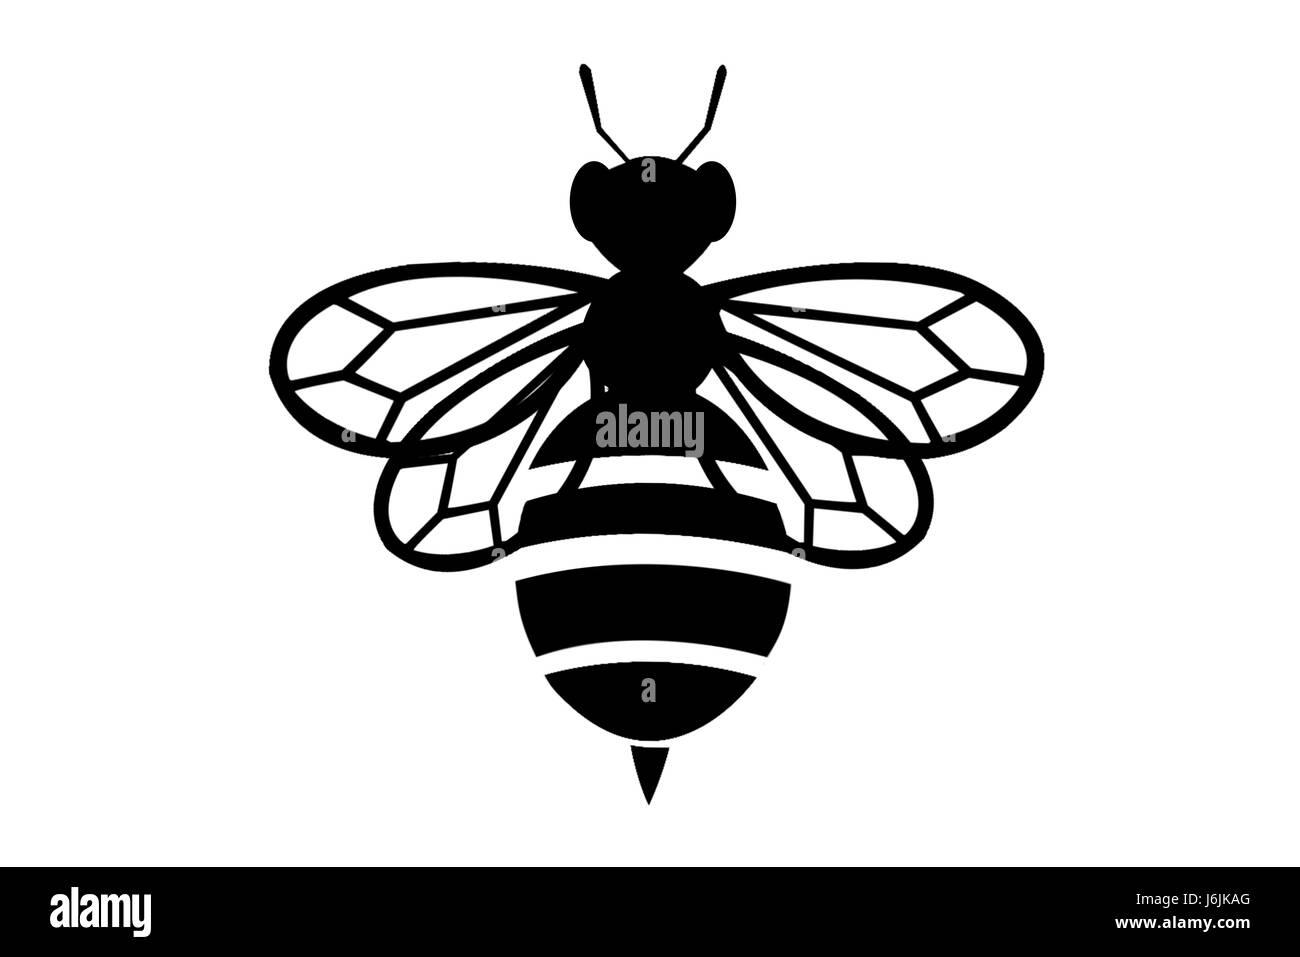 black Bee on white background symbol silhouette icon - Stock Image